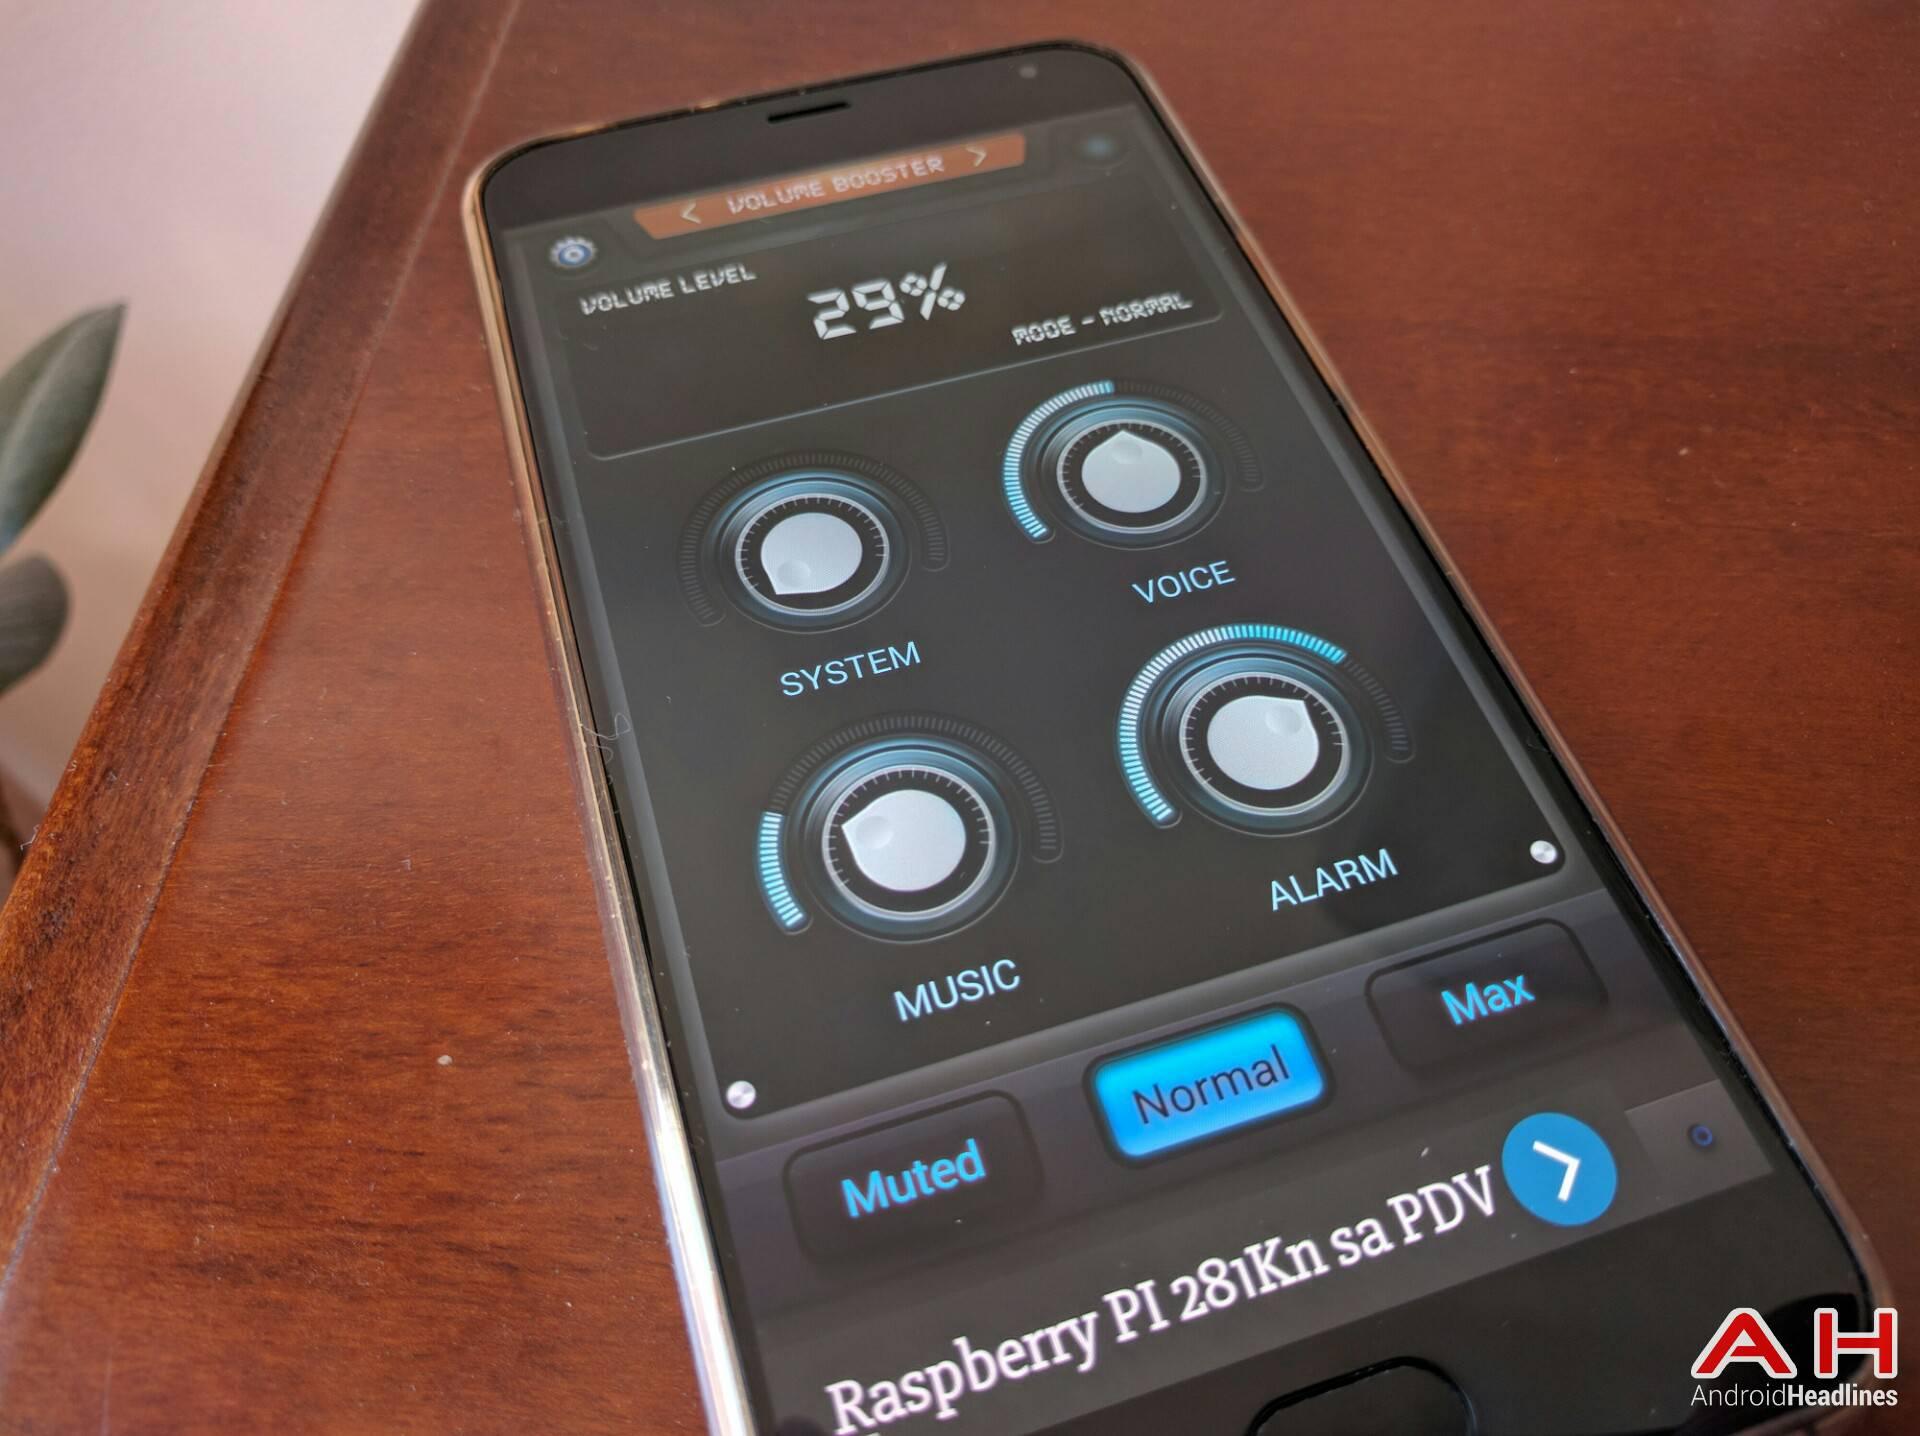 AH Volume Booster Pro app_1